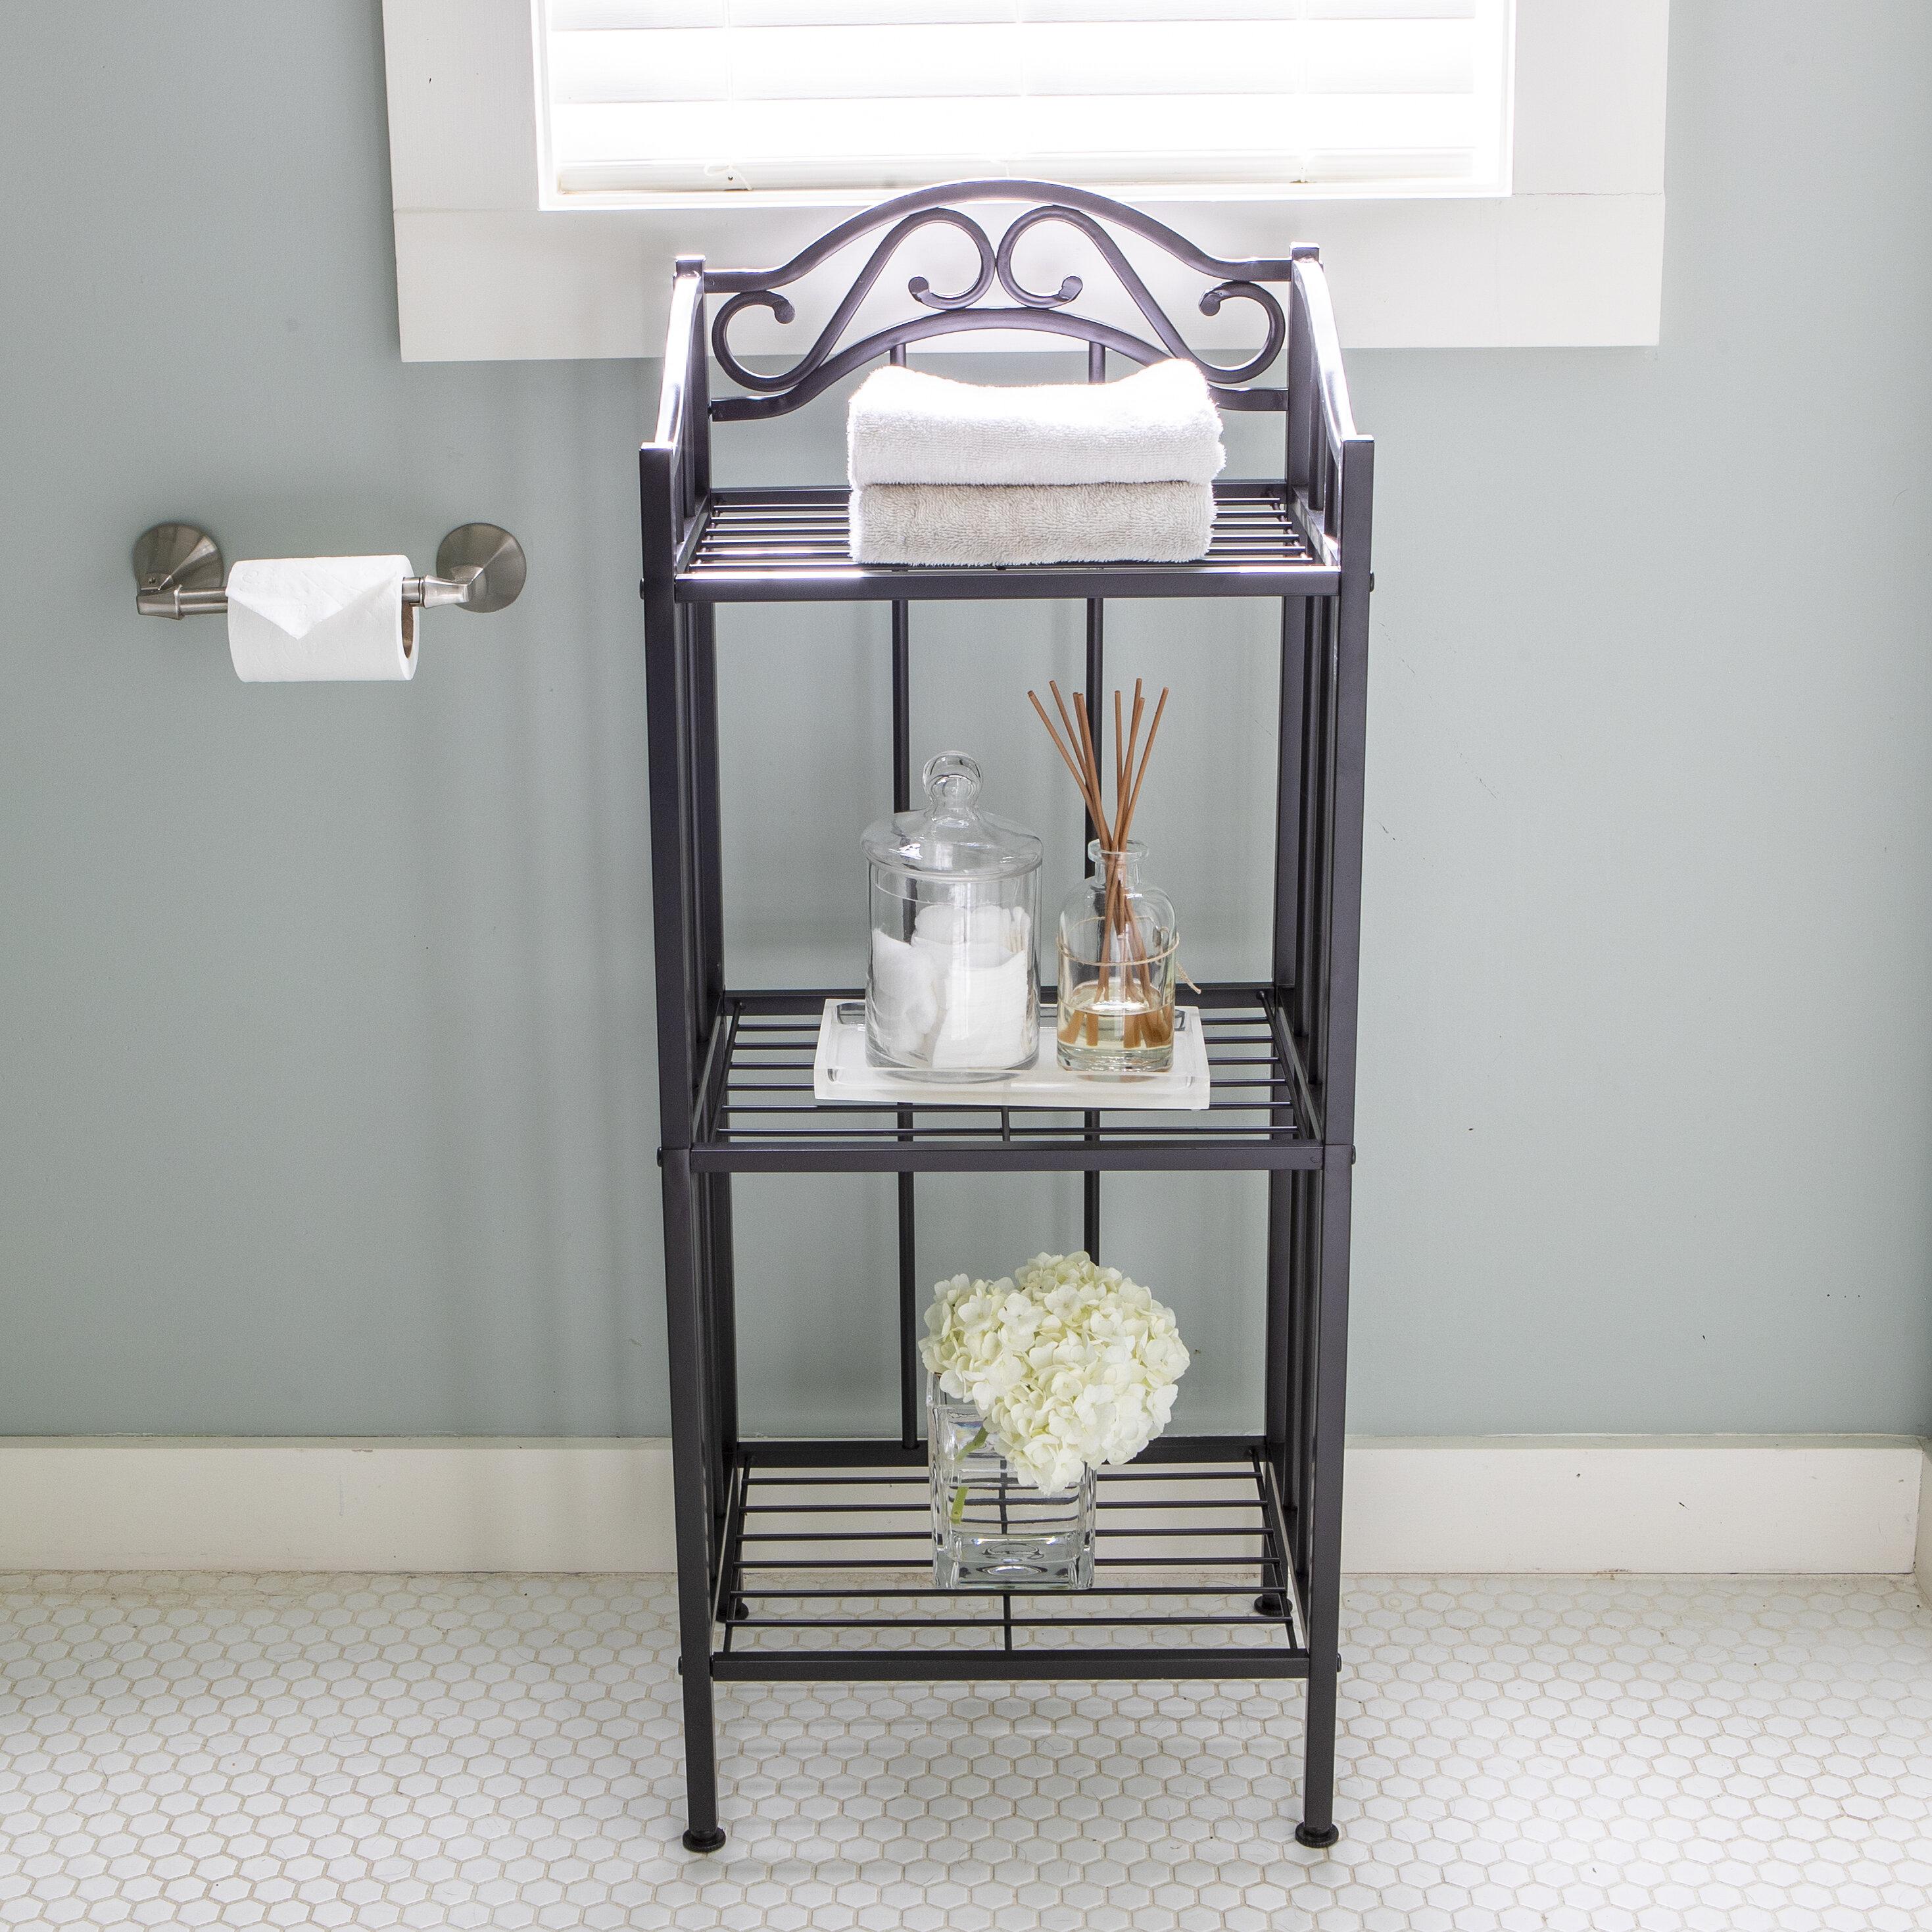 Canora Grey Paille 11 W X 36 H X 14 5 D Free Standing Bathroom Shelves Reviews Wayfair